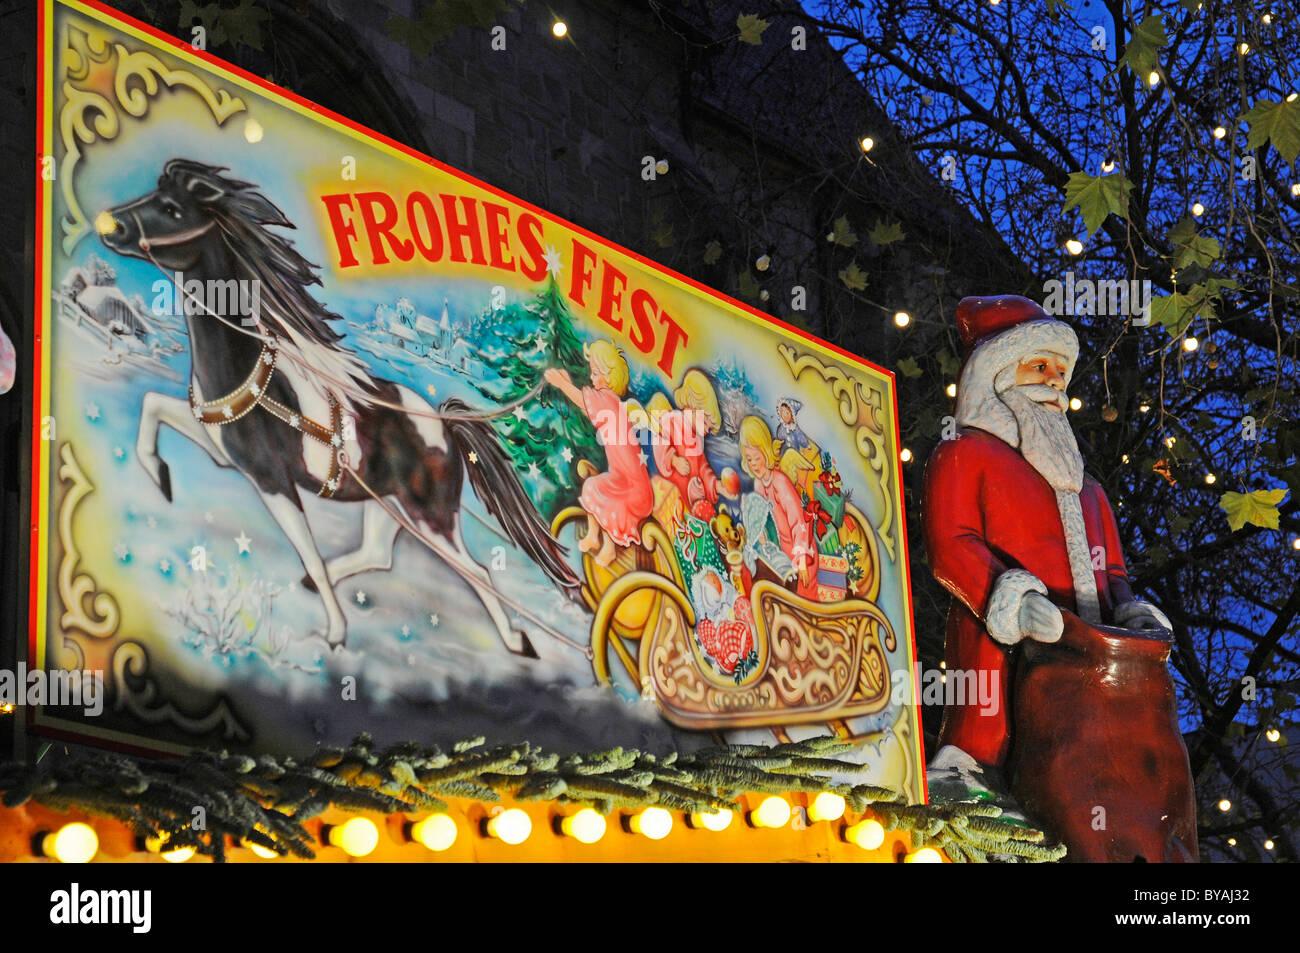 Frohes Fest or happy holidays, sign on the Christmas market, Dortmund, Ruhrgebiet region, North Rhine-Westphalia - Stock Image